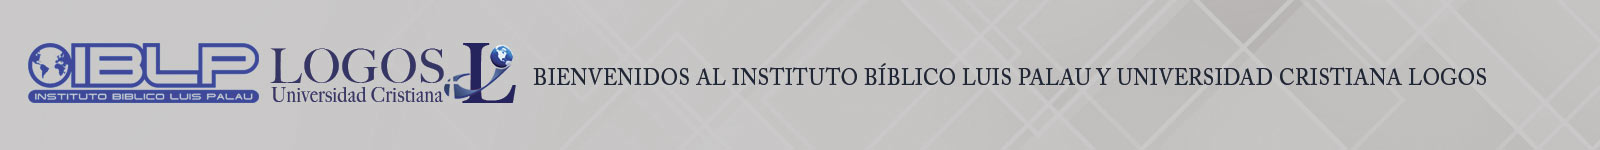 Instituto Bíblico Luis Palau - Logos